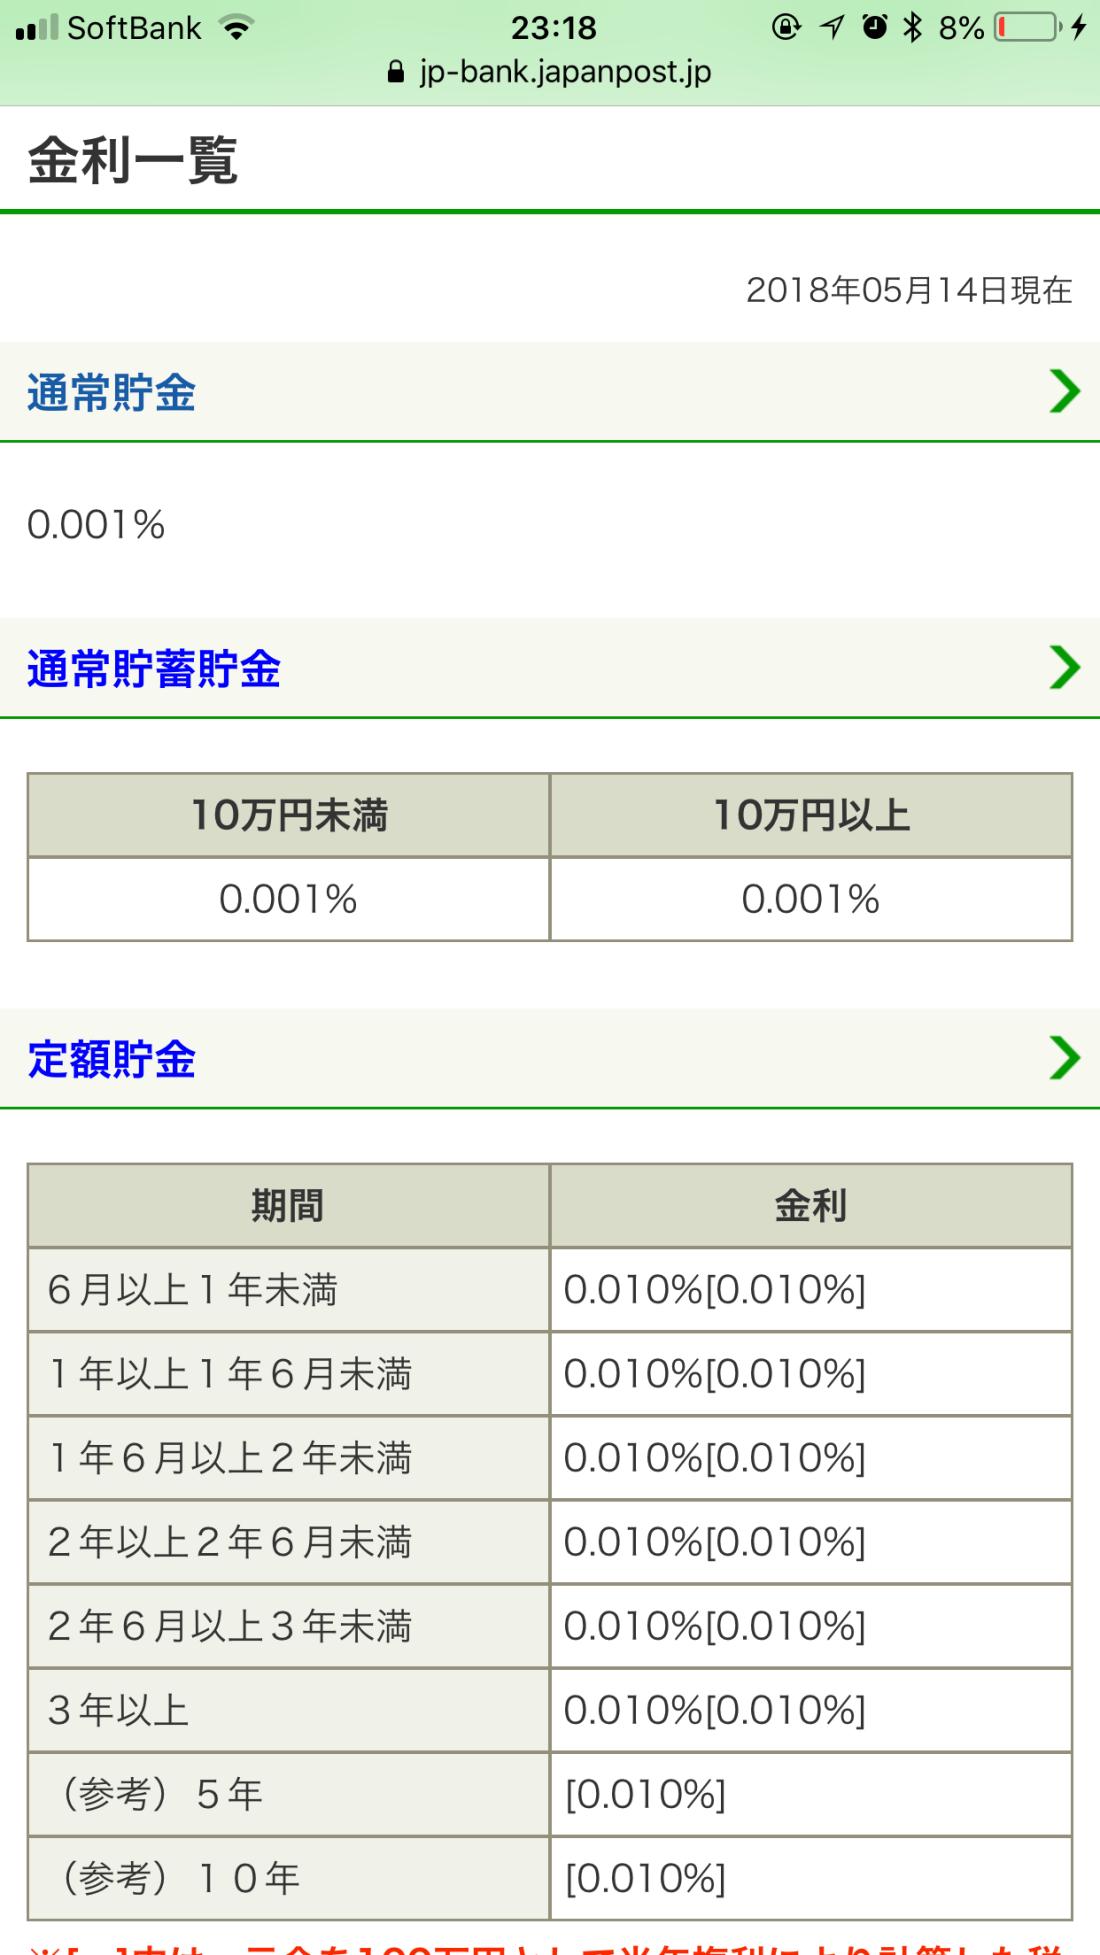 BD8EB7DD-8C3D-4757-A126-15A6CA11504D